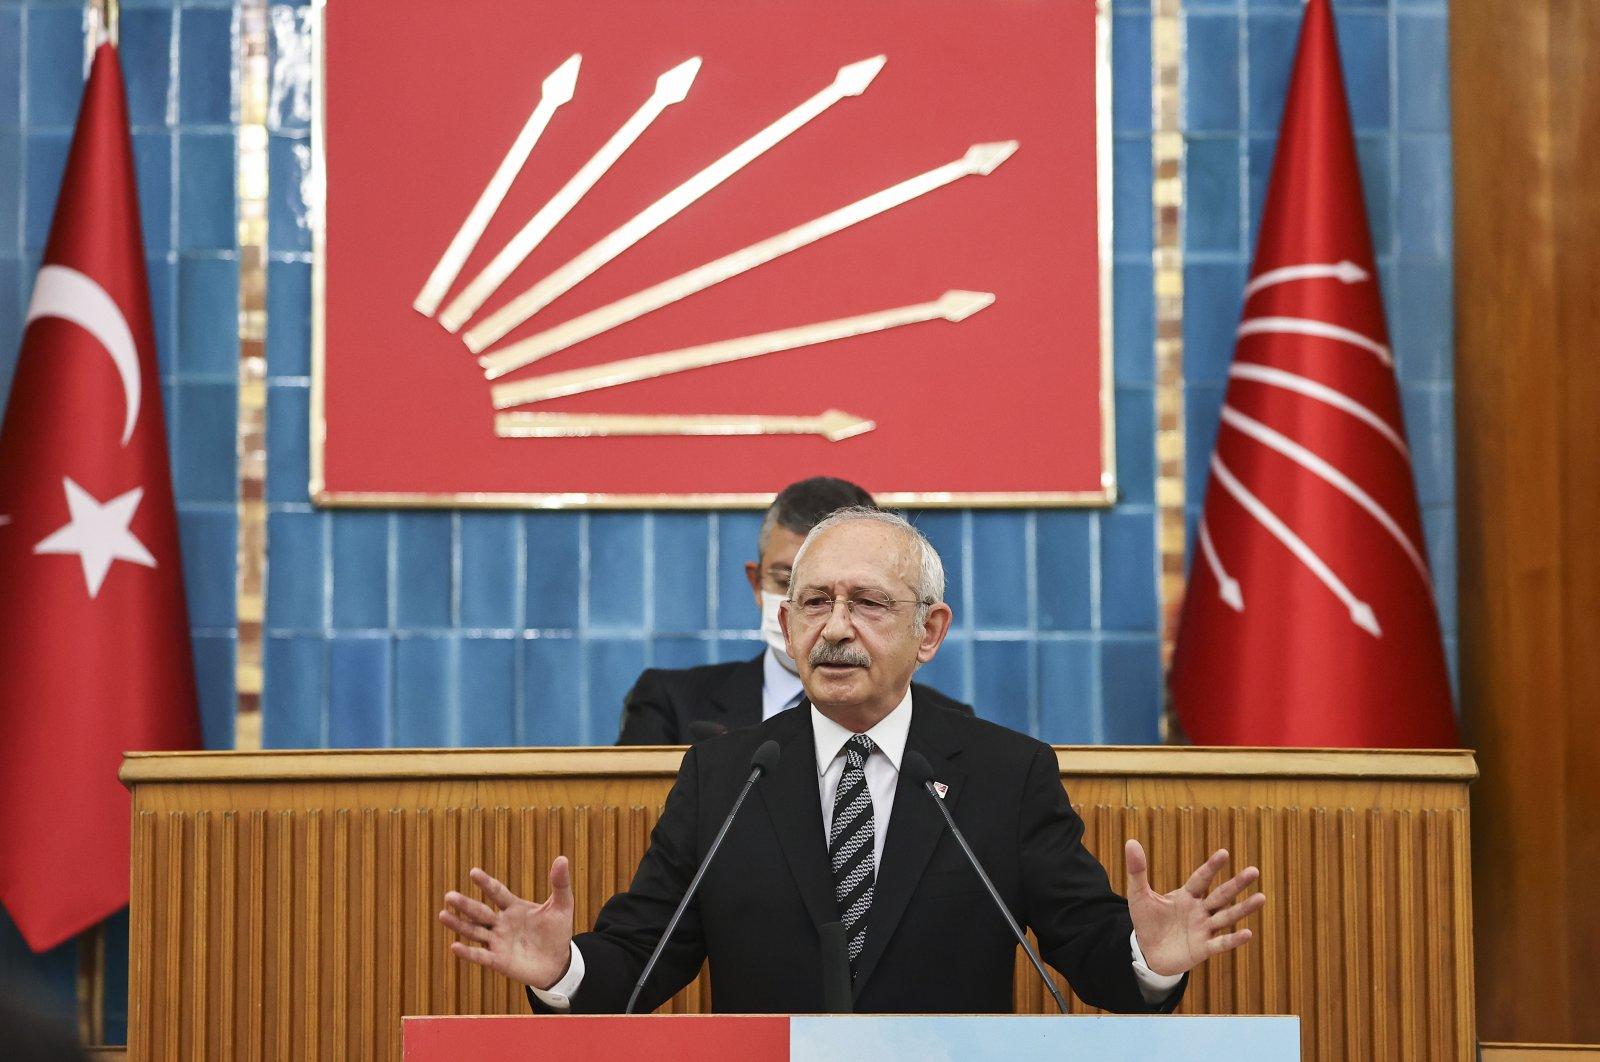 CHP Chairperson Kemal Kılıçdaroğlu speaks at his party's parliamentary group meeting in Ankara, Turkey, July 13, 2021. (AA Photo)